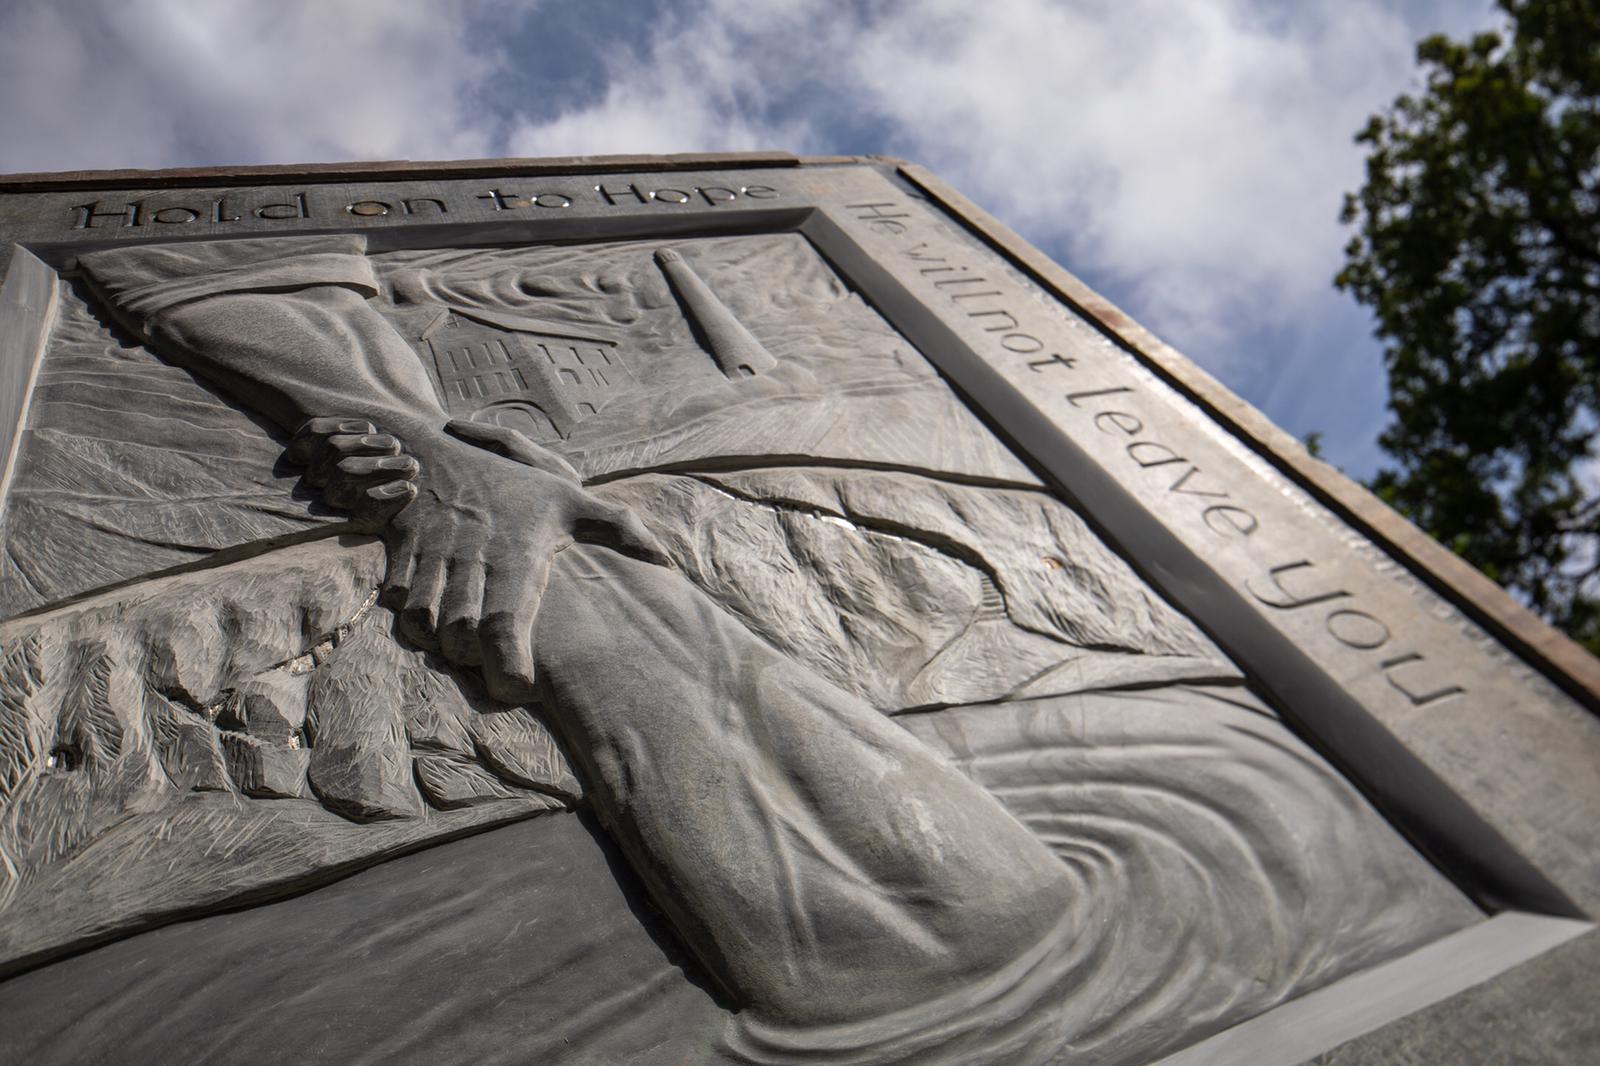 Mining disaster memorial